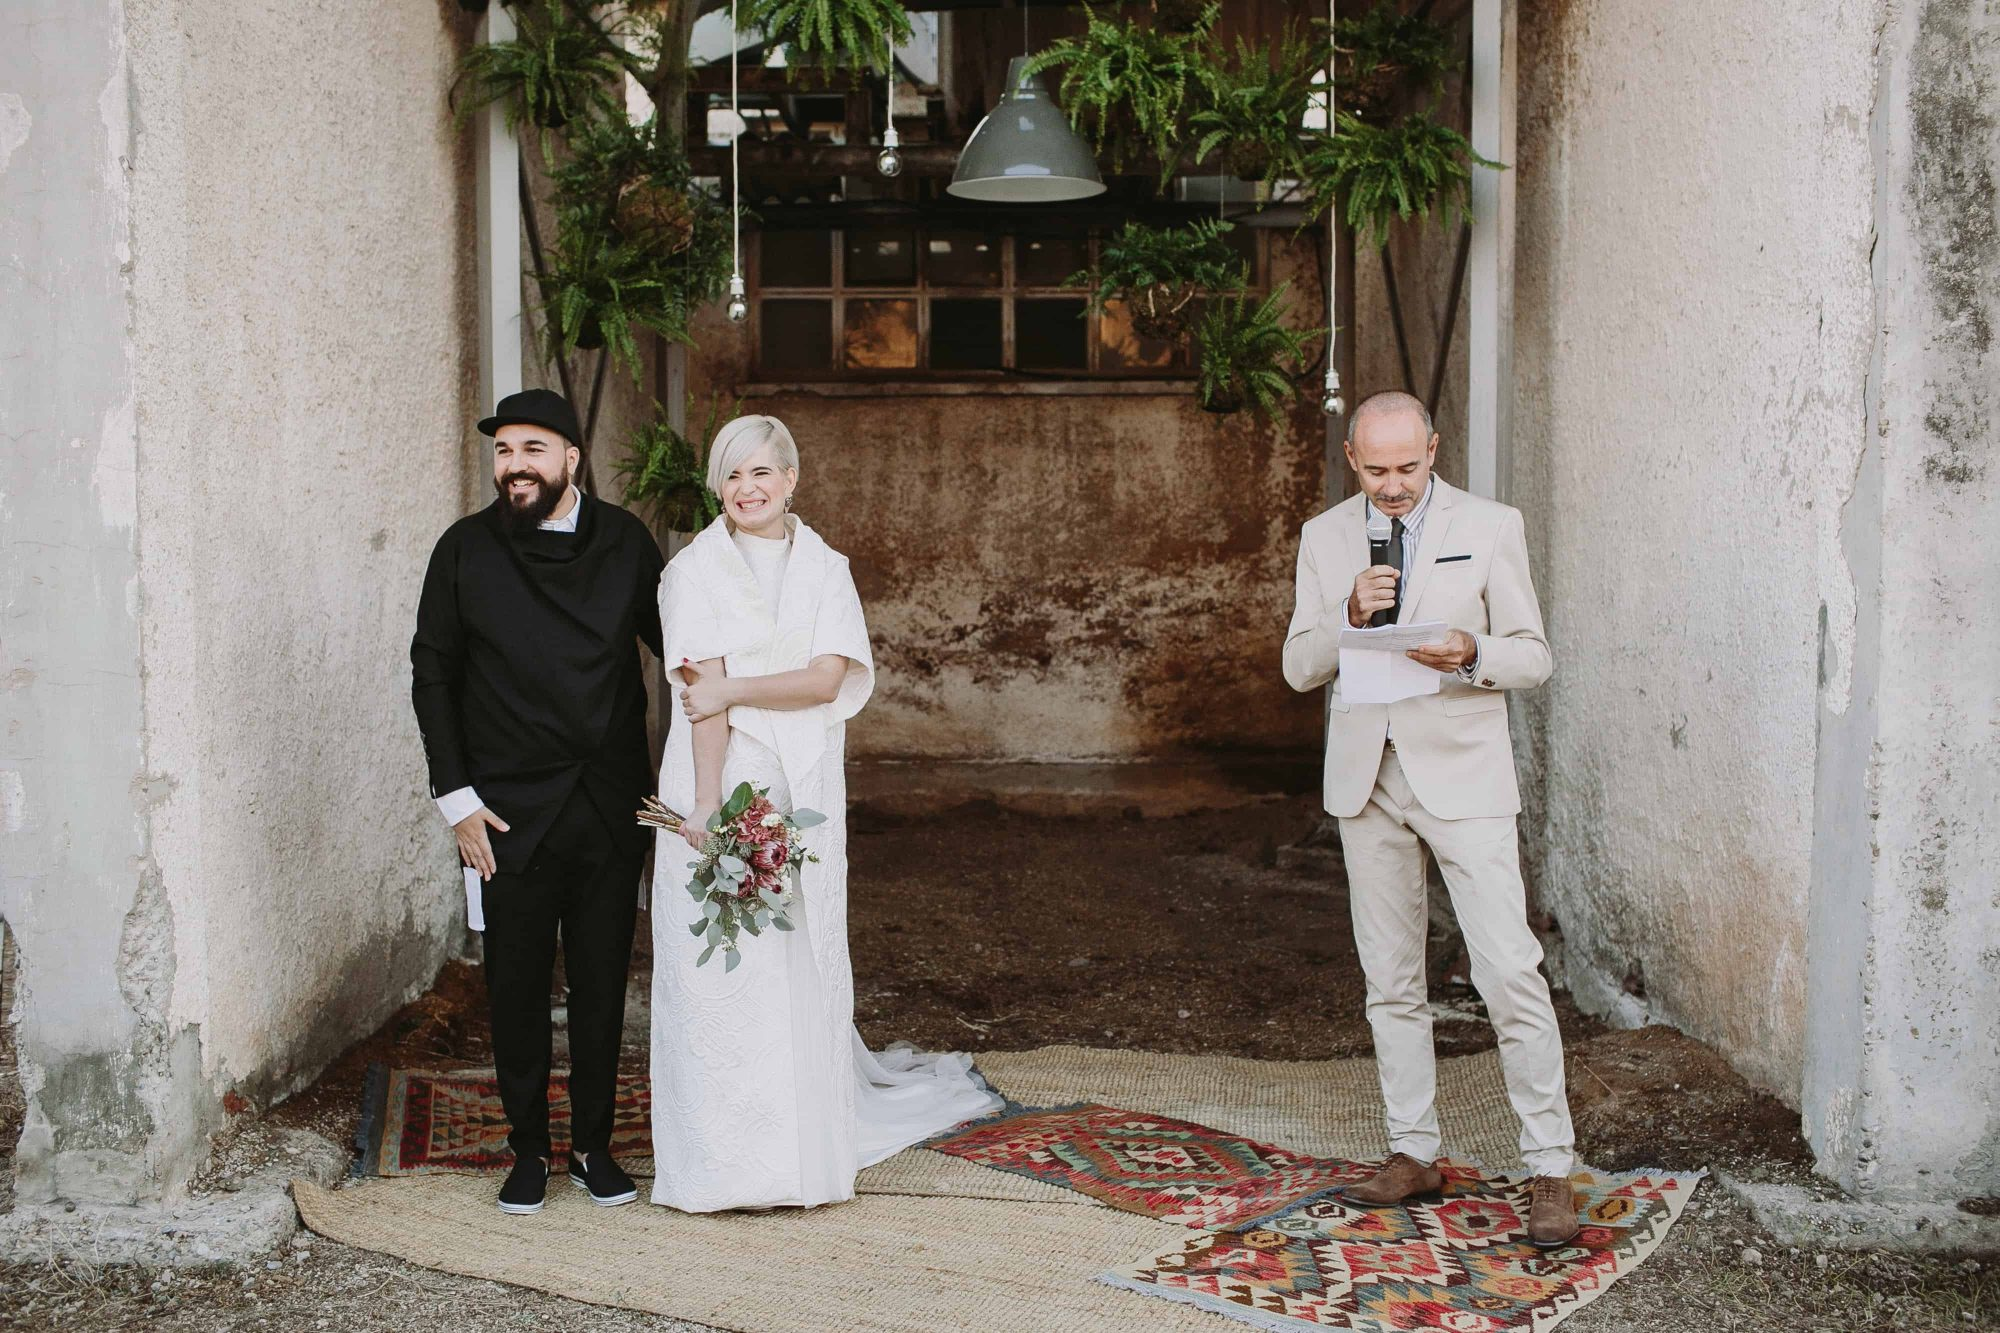 ceremonia-wedding-jesana-ivan